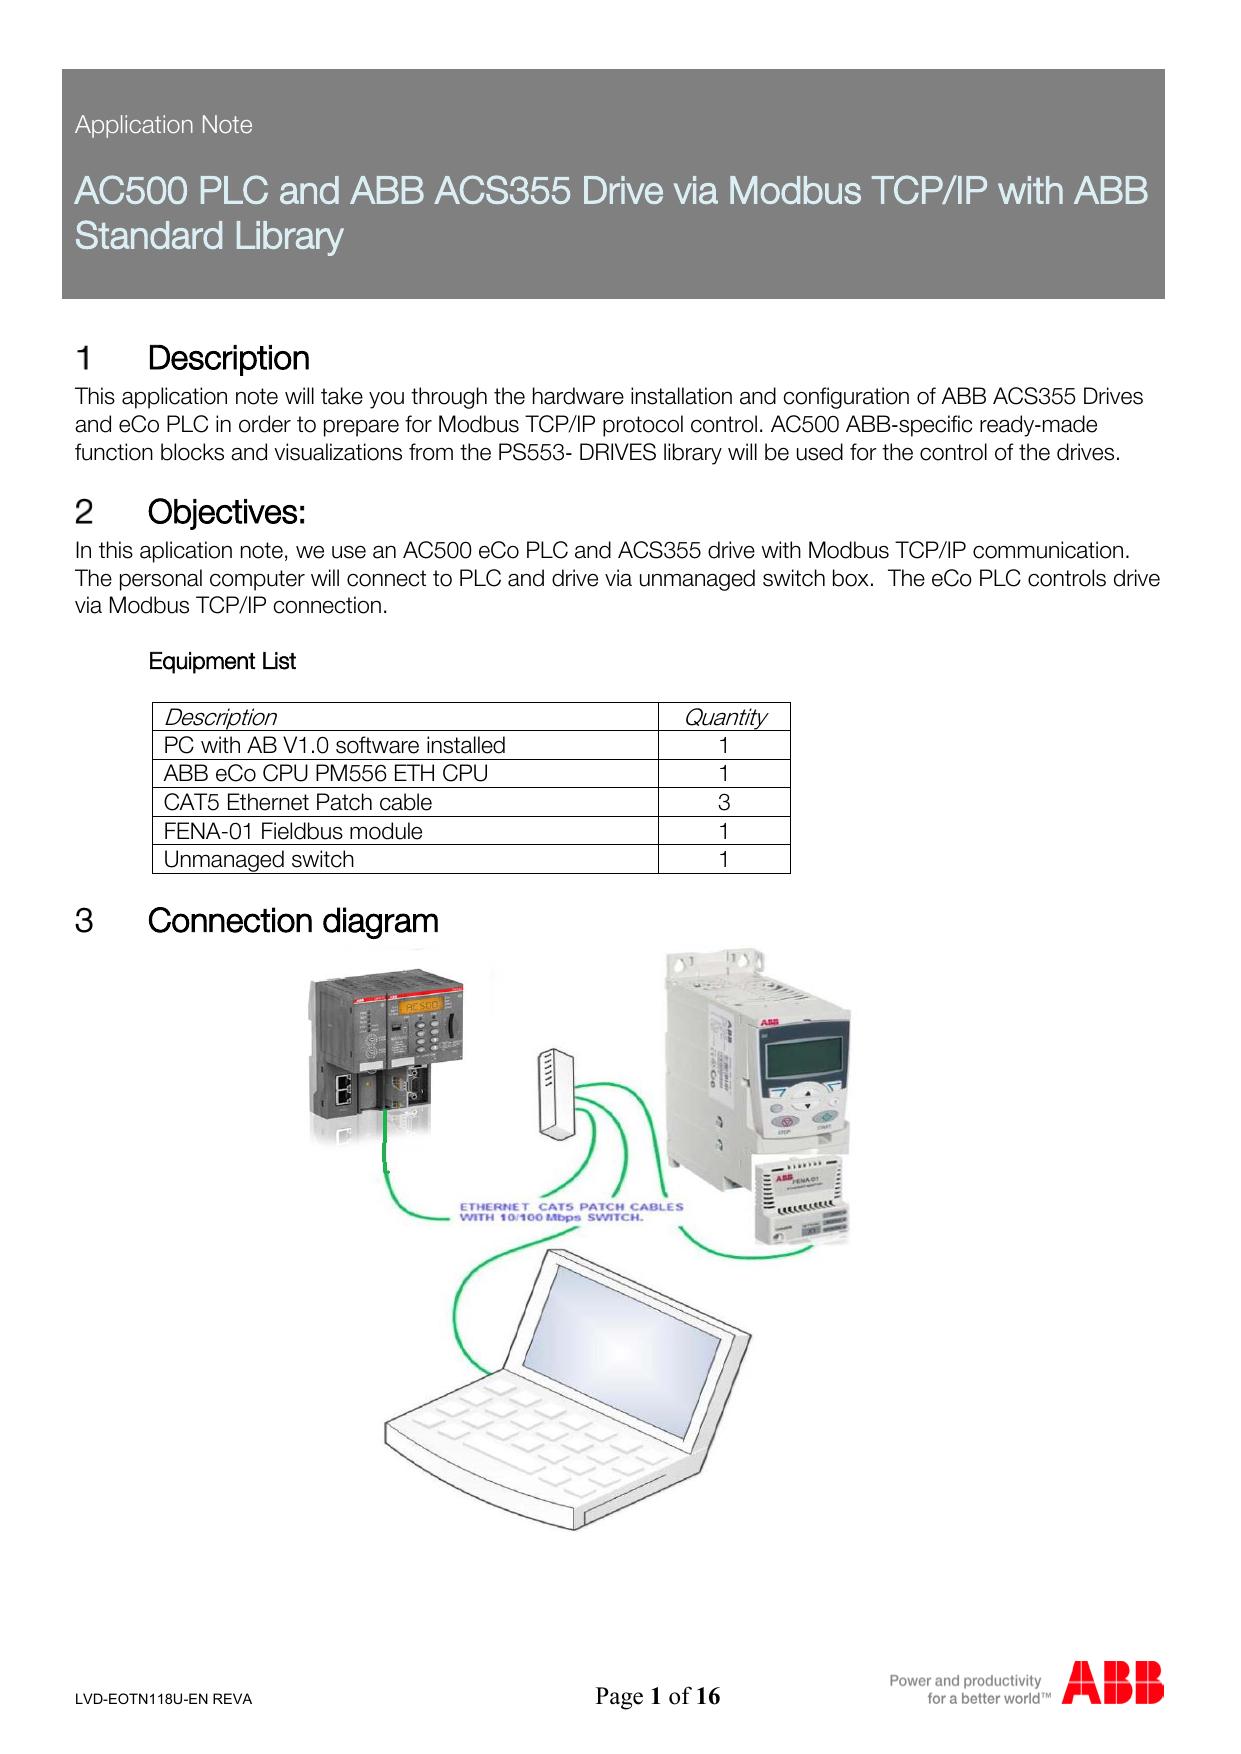 abb acs355 wiring diagram ac500 plc and abb acs355 drive via modbus tcp manualzz  plc and abb acs355 drive via modbus tcp